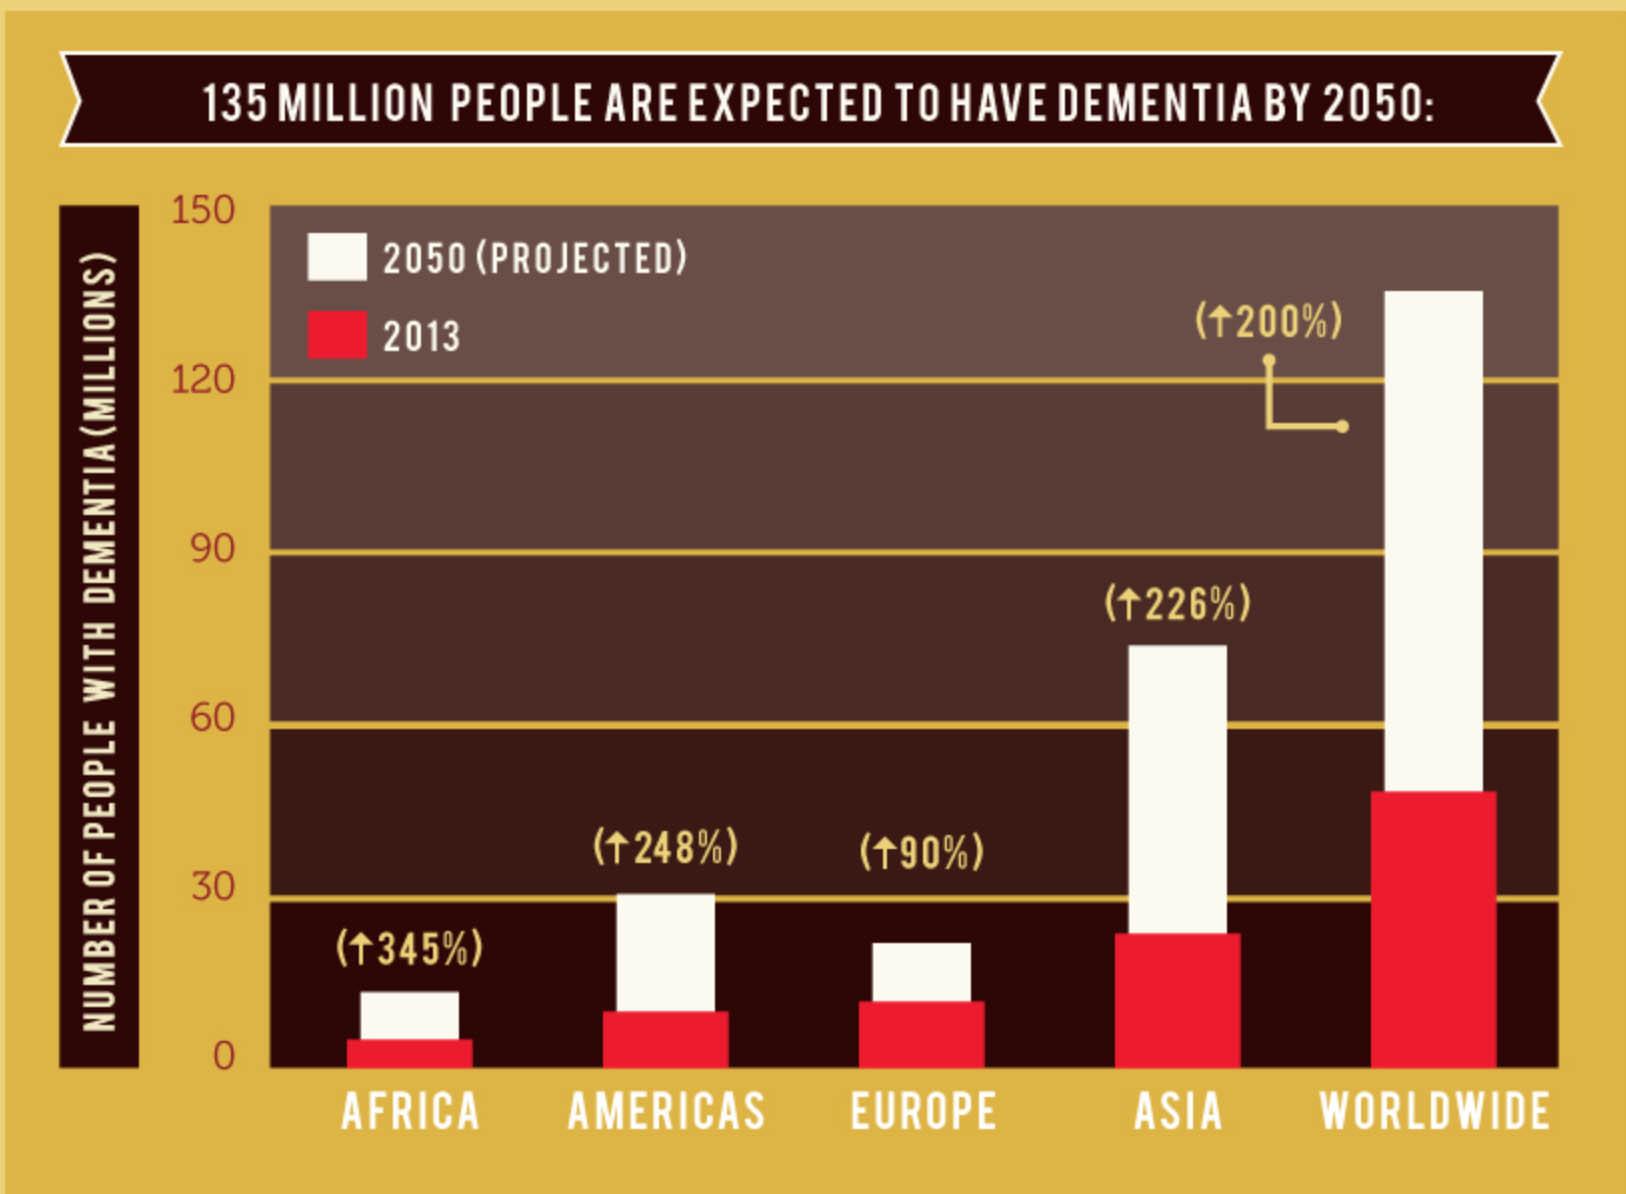 infographic extract